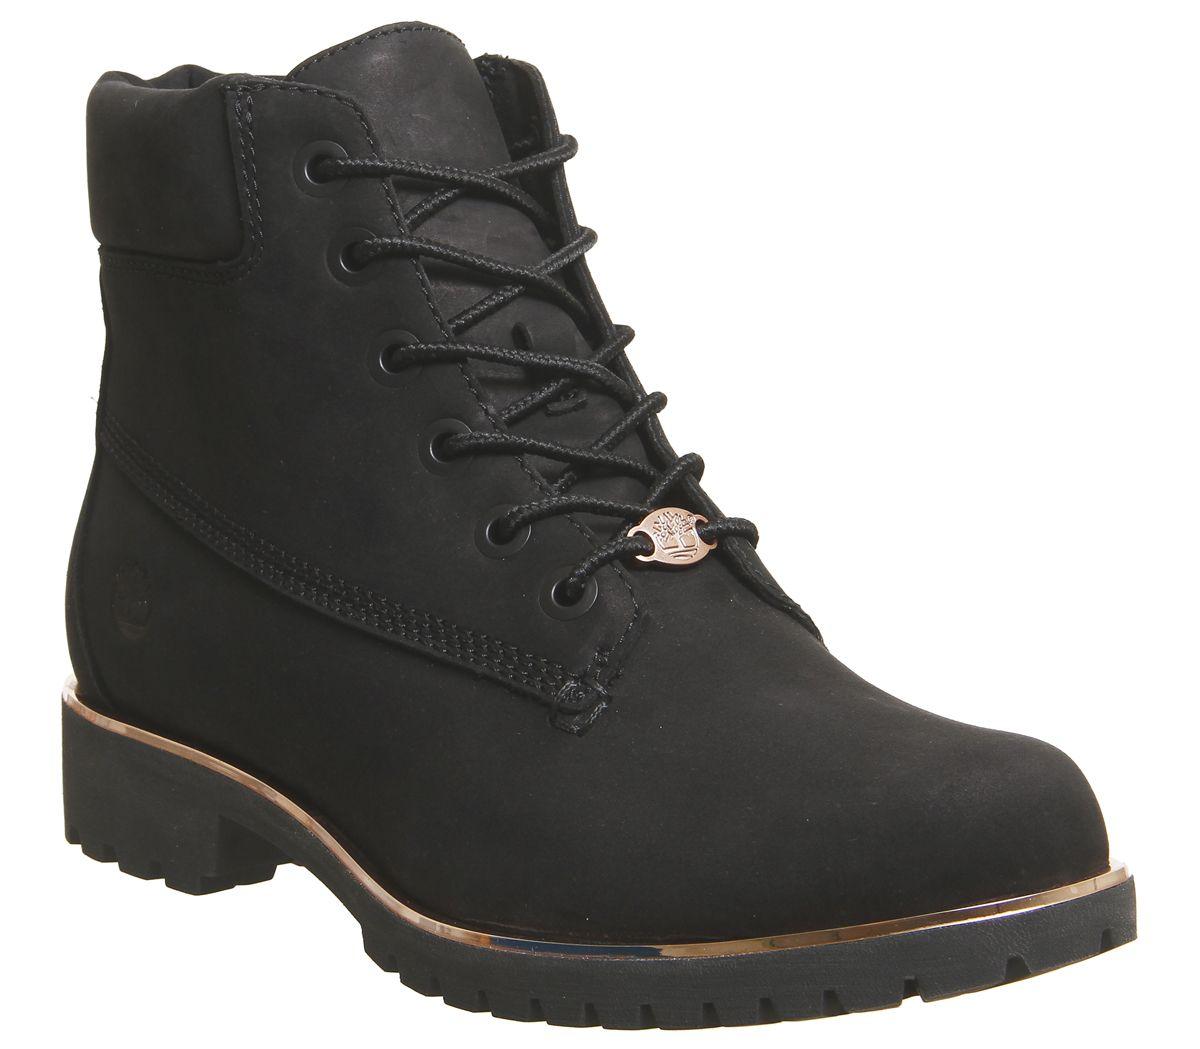 Timberland Slim Premium 6 Inch Boots Black Rose Gold Rand